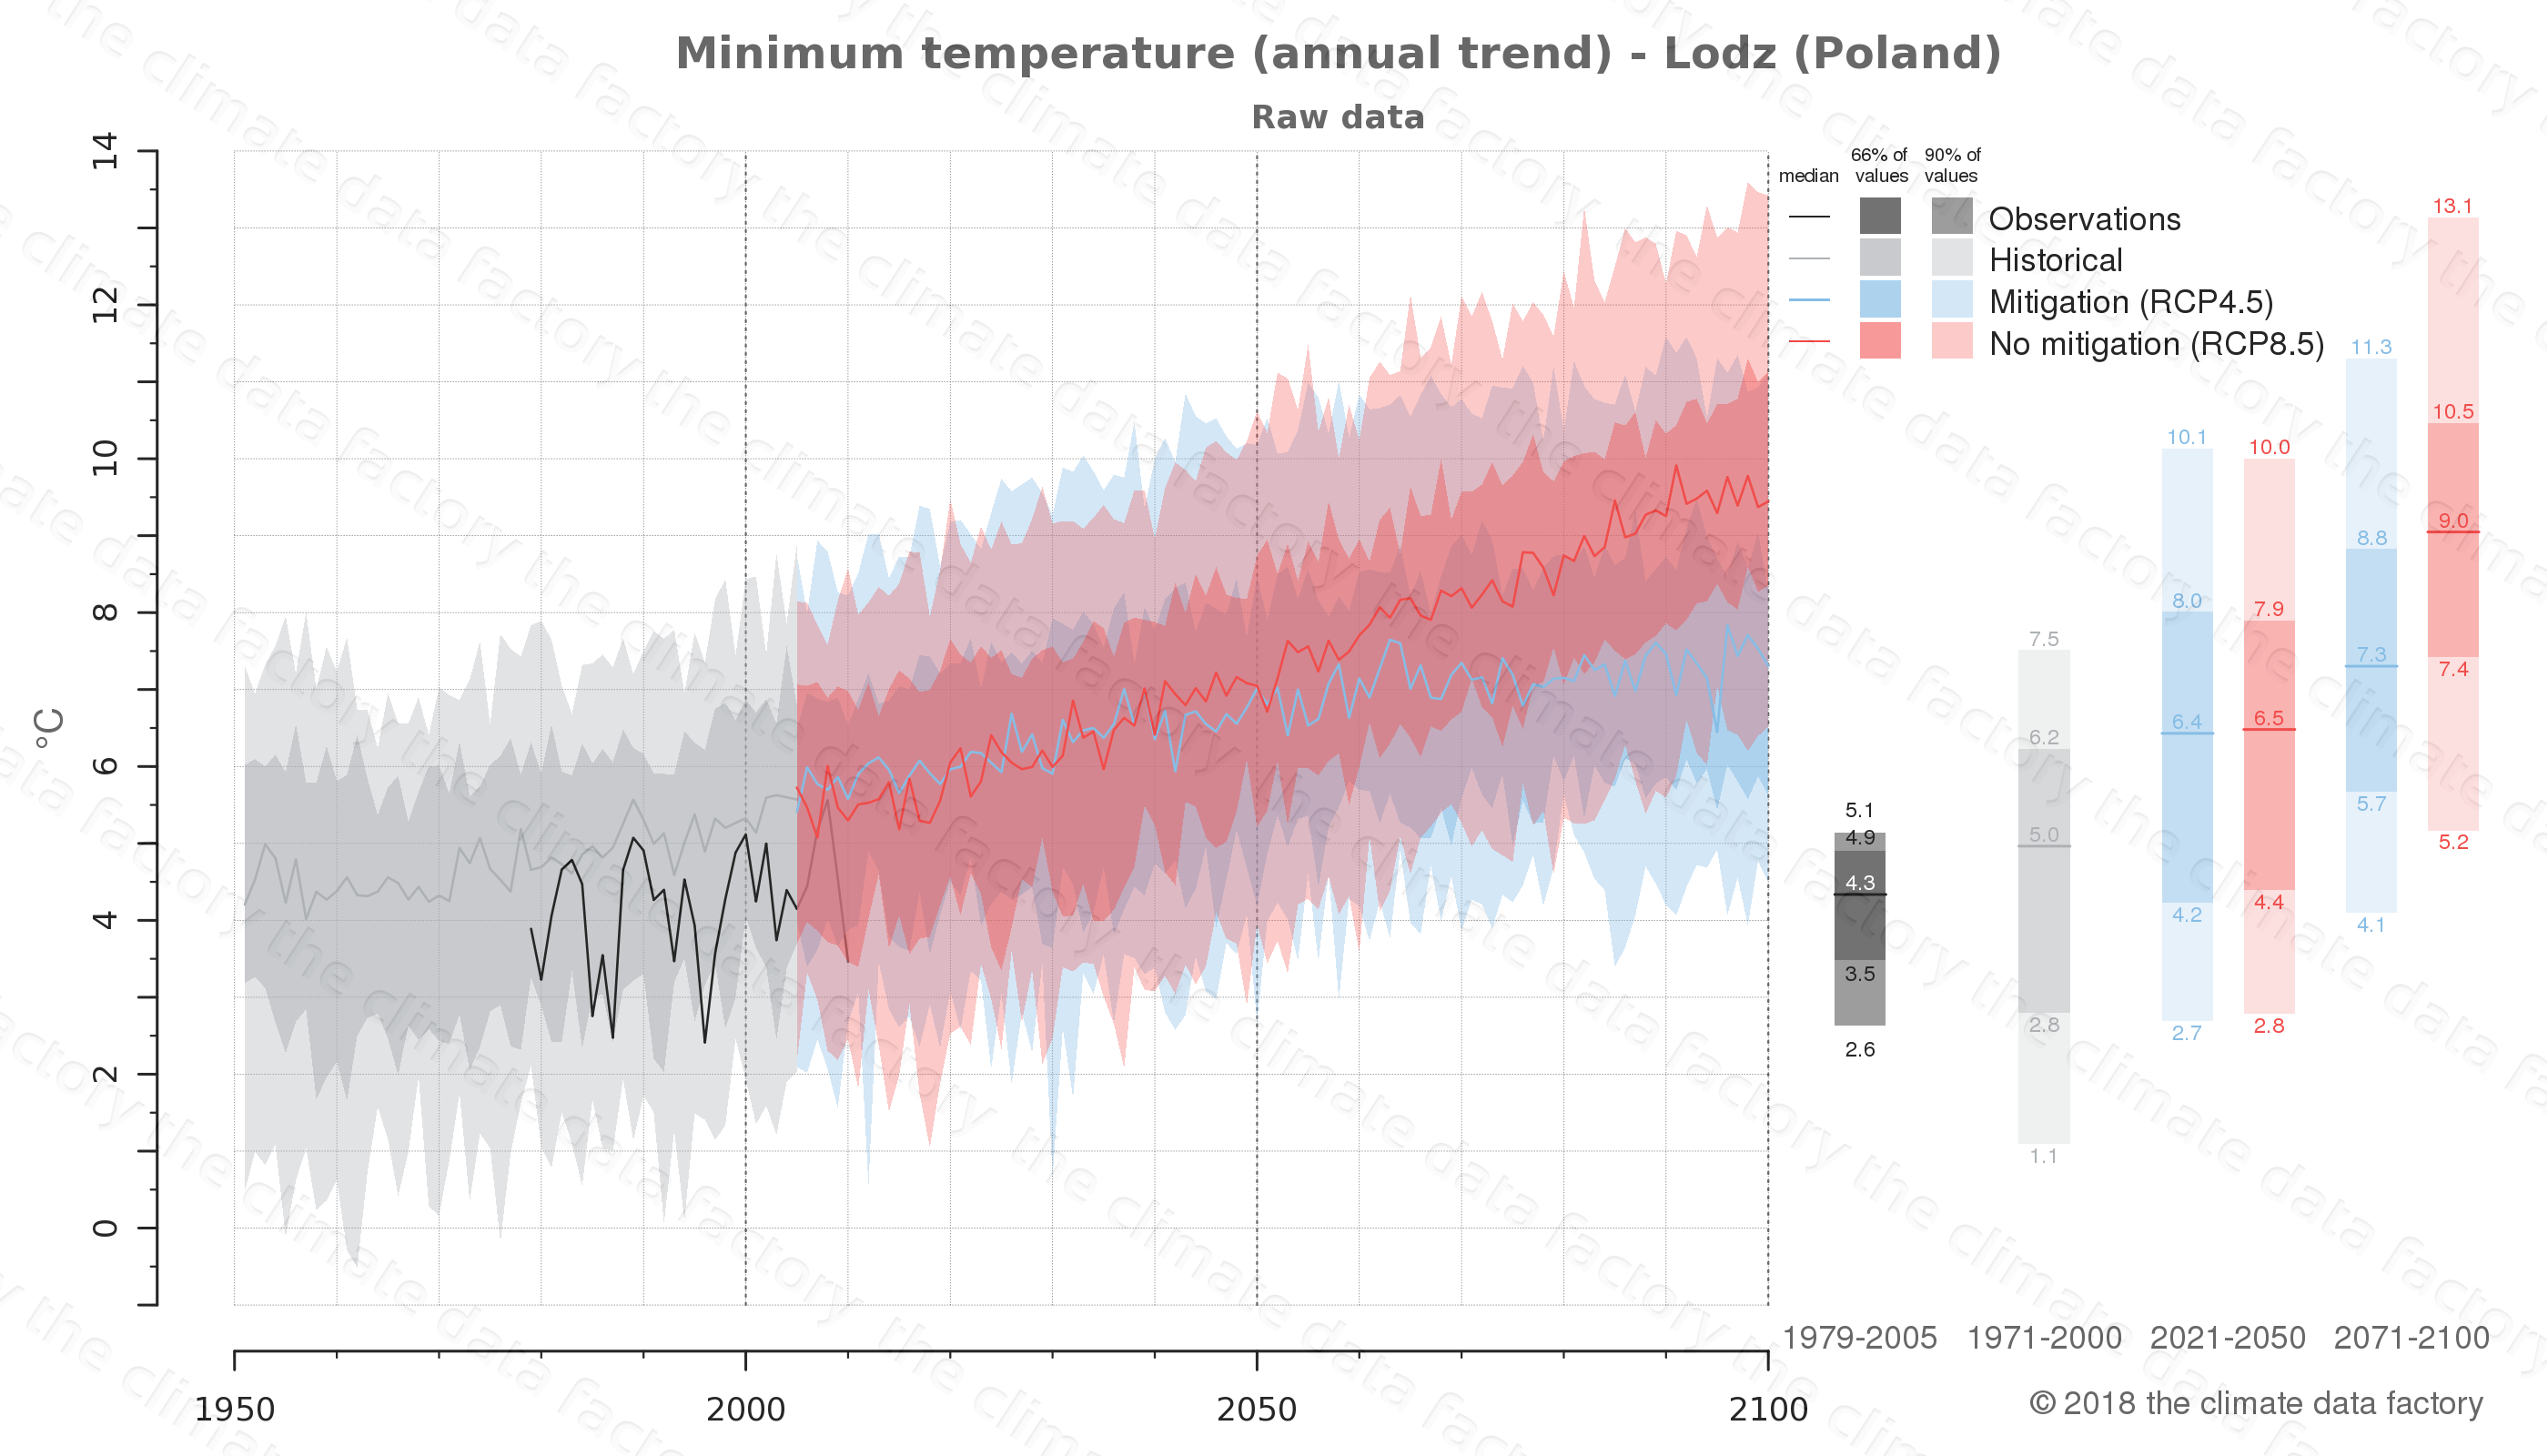 climate change data policy adaptation climate graph city data minimum-temperature lodz poland